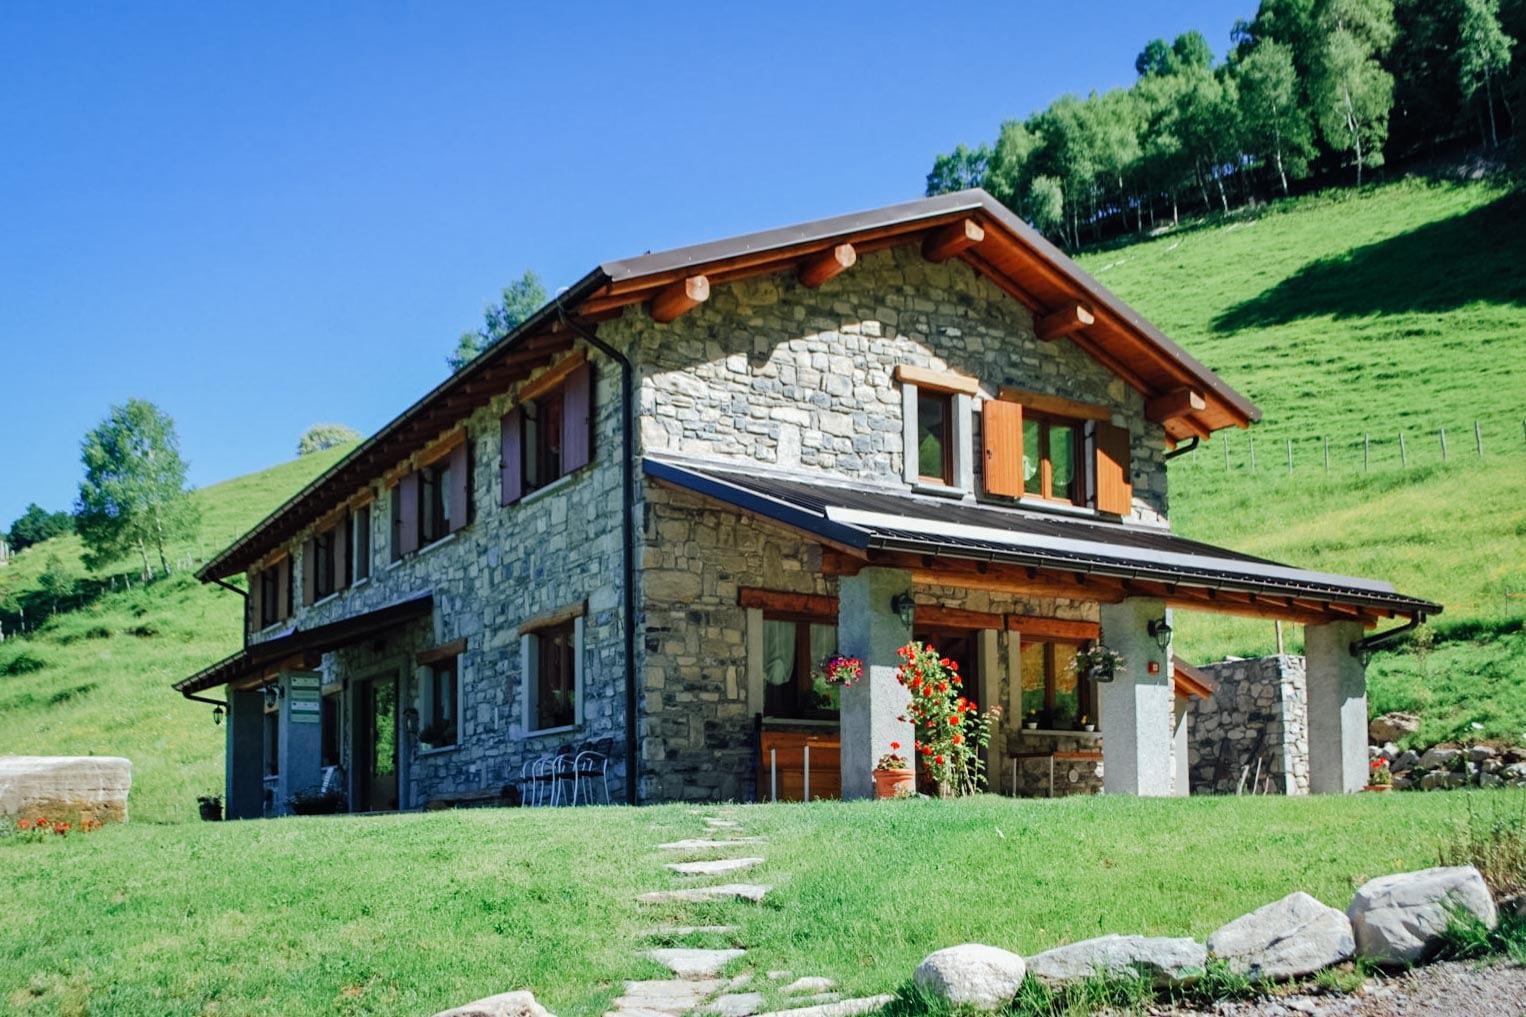 Agriturismo Le Radici - Alpe di Blessagno